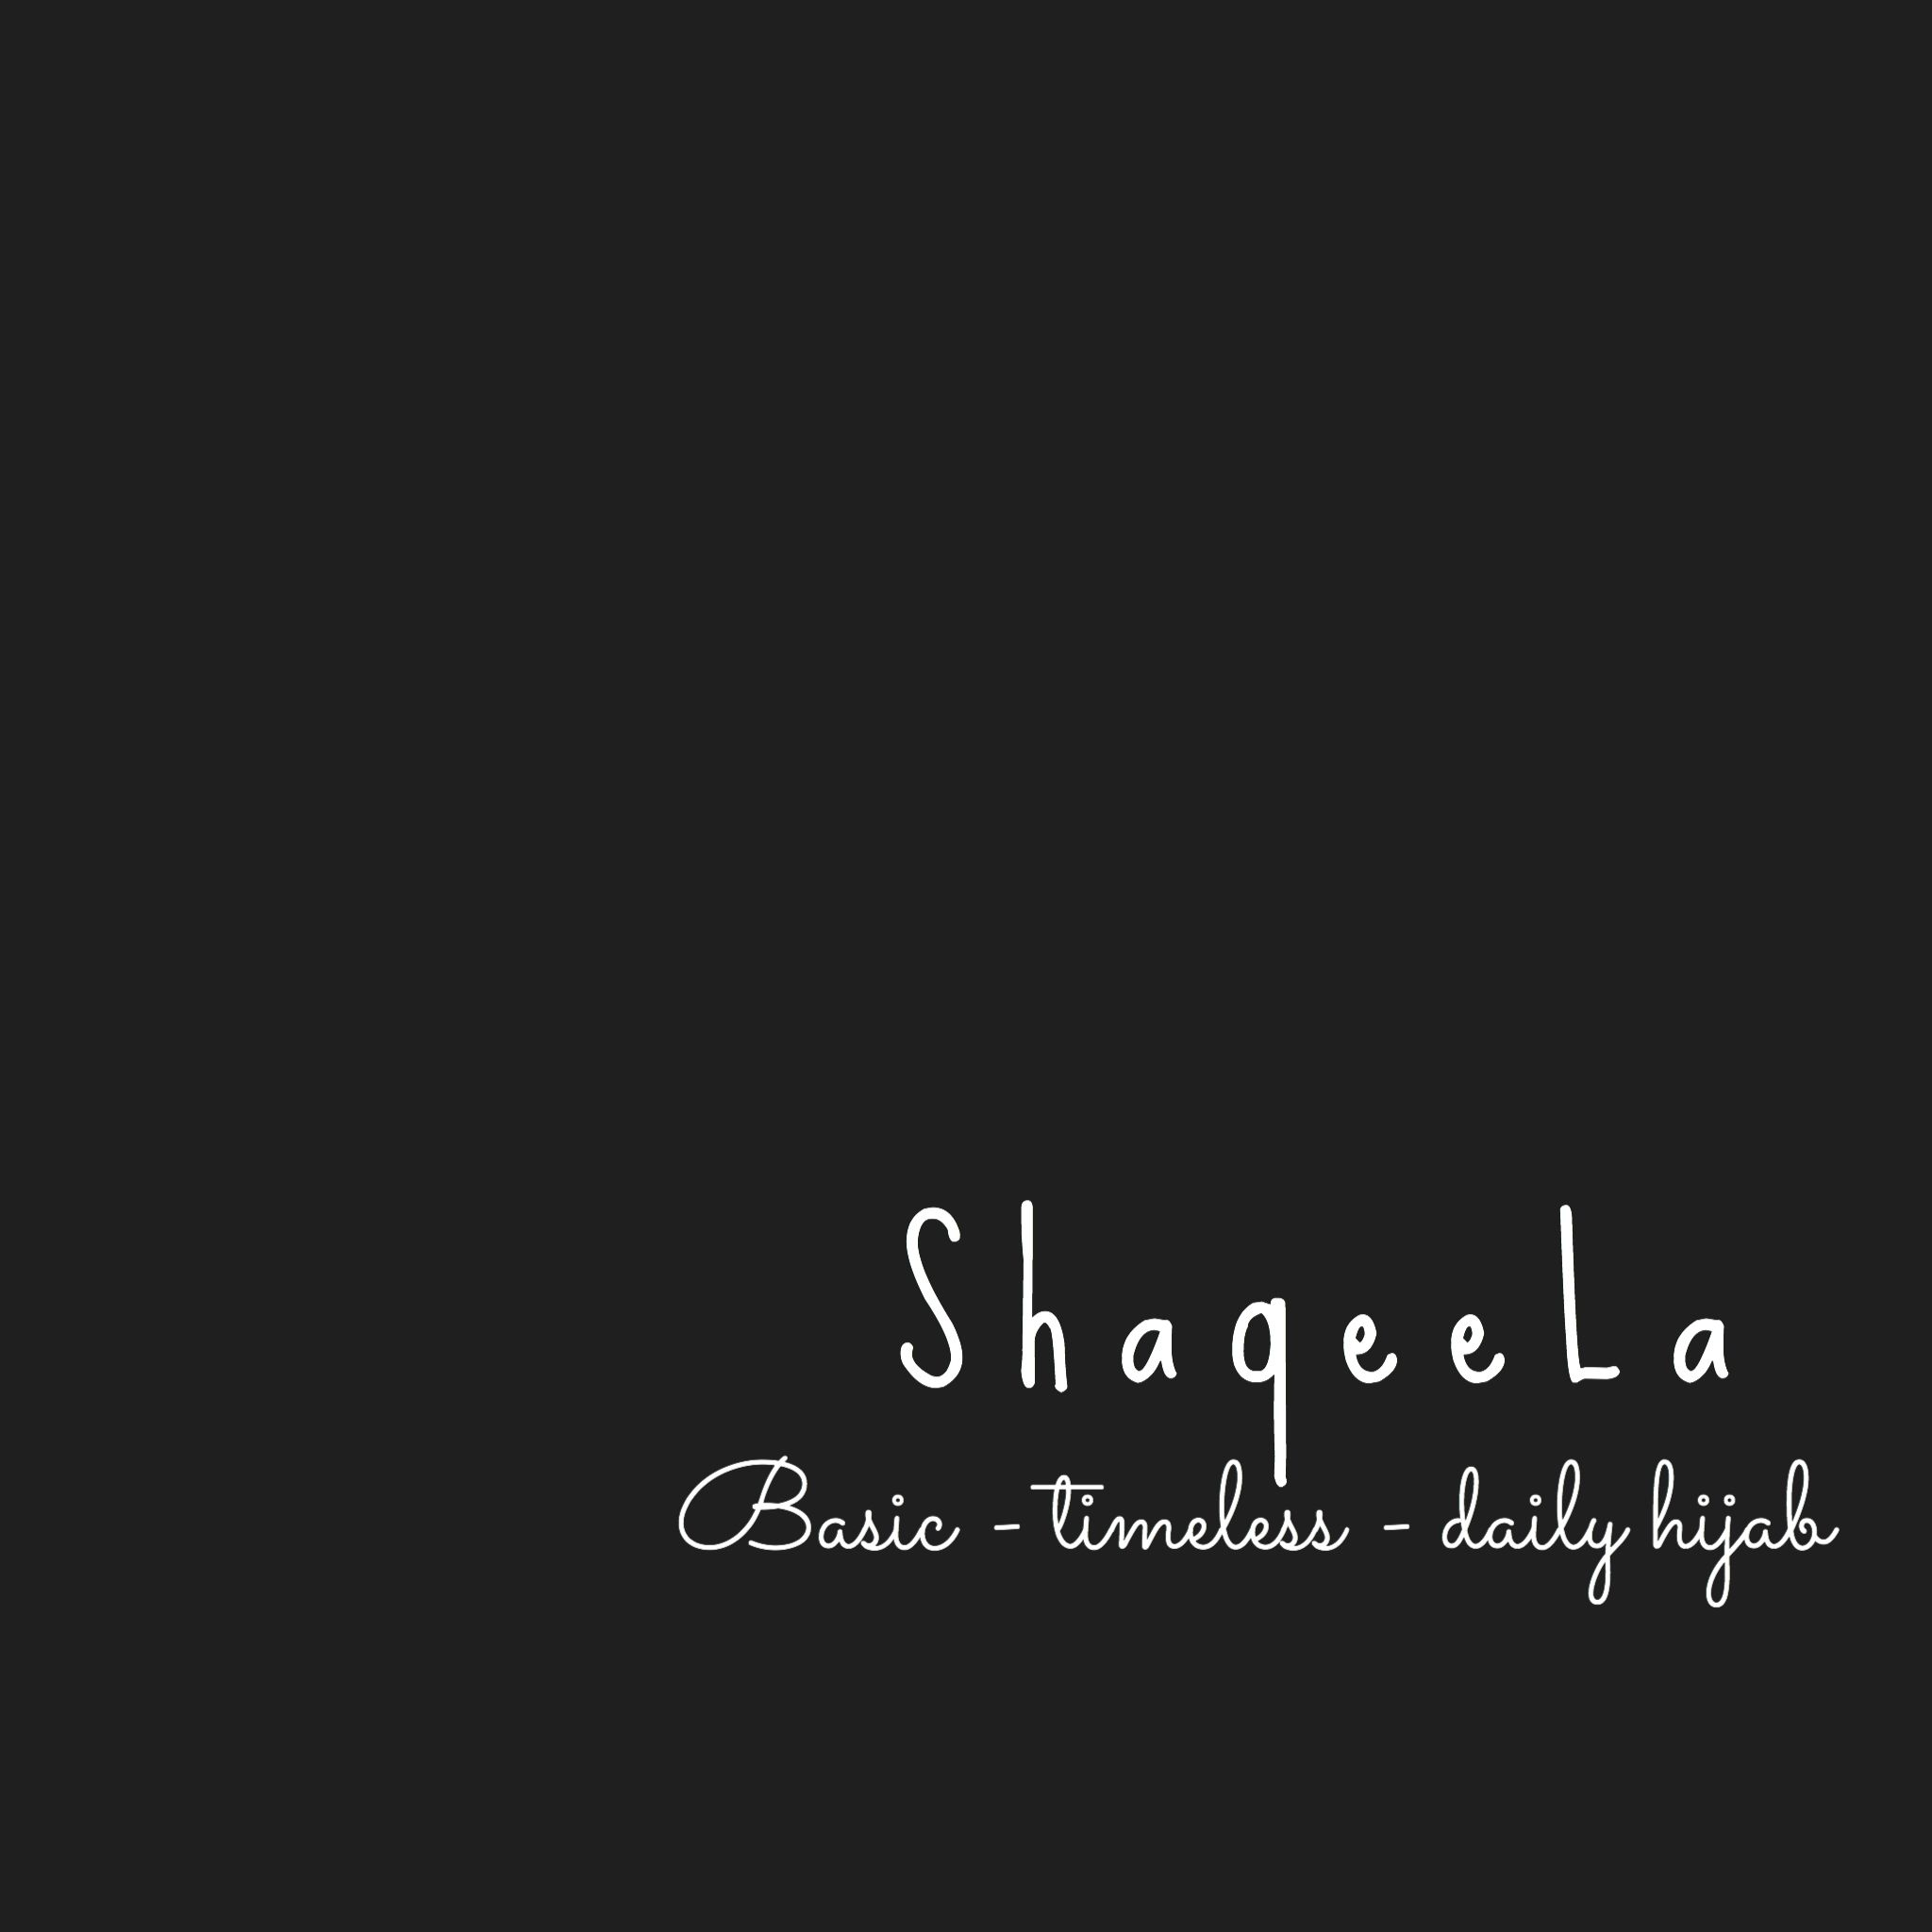 shaqeela